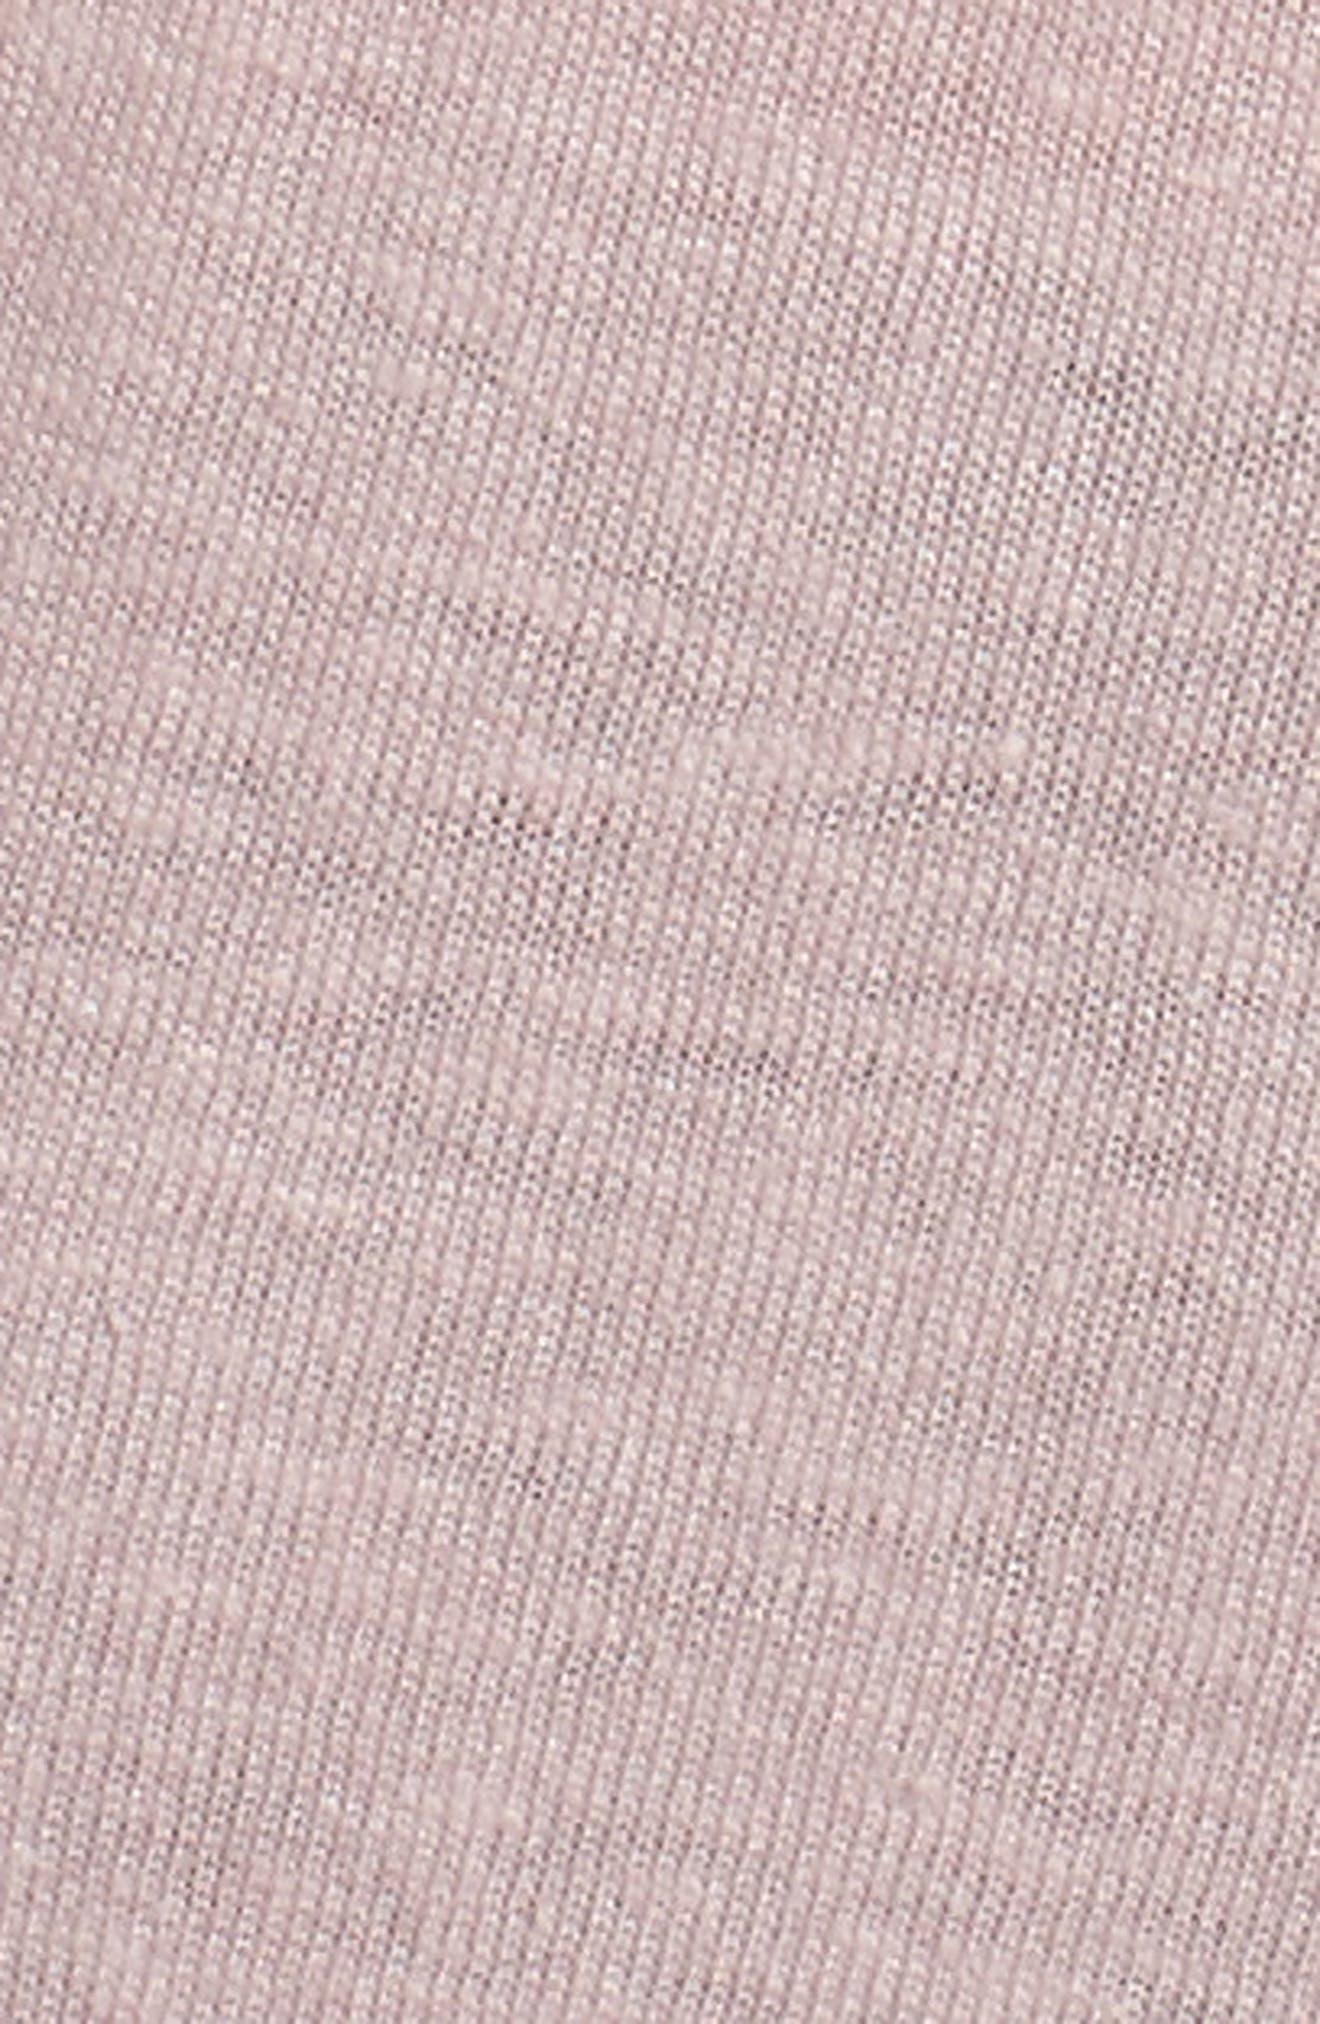 x Donald Robertson Black Dresses Sweatshirt,                             Alternate thumbnail 5, color,                             670